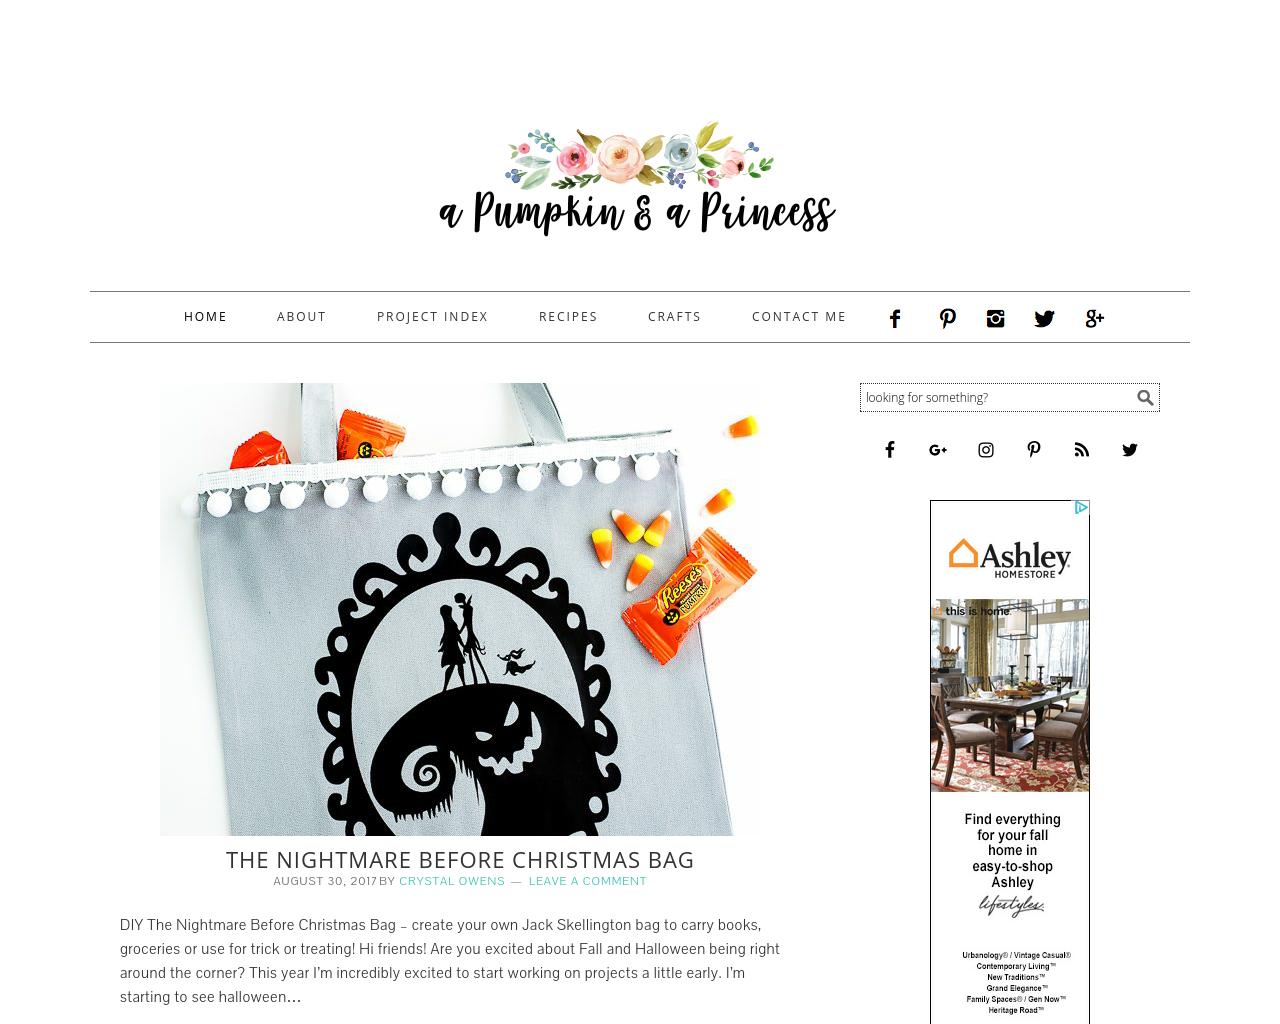 A-Pumpkin-And-A-Princess-Advertising-Reviews-Pricing